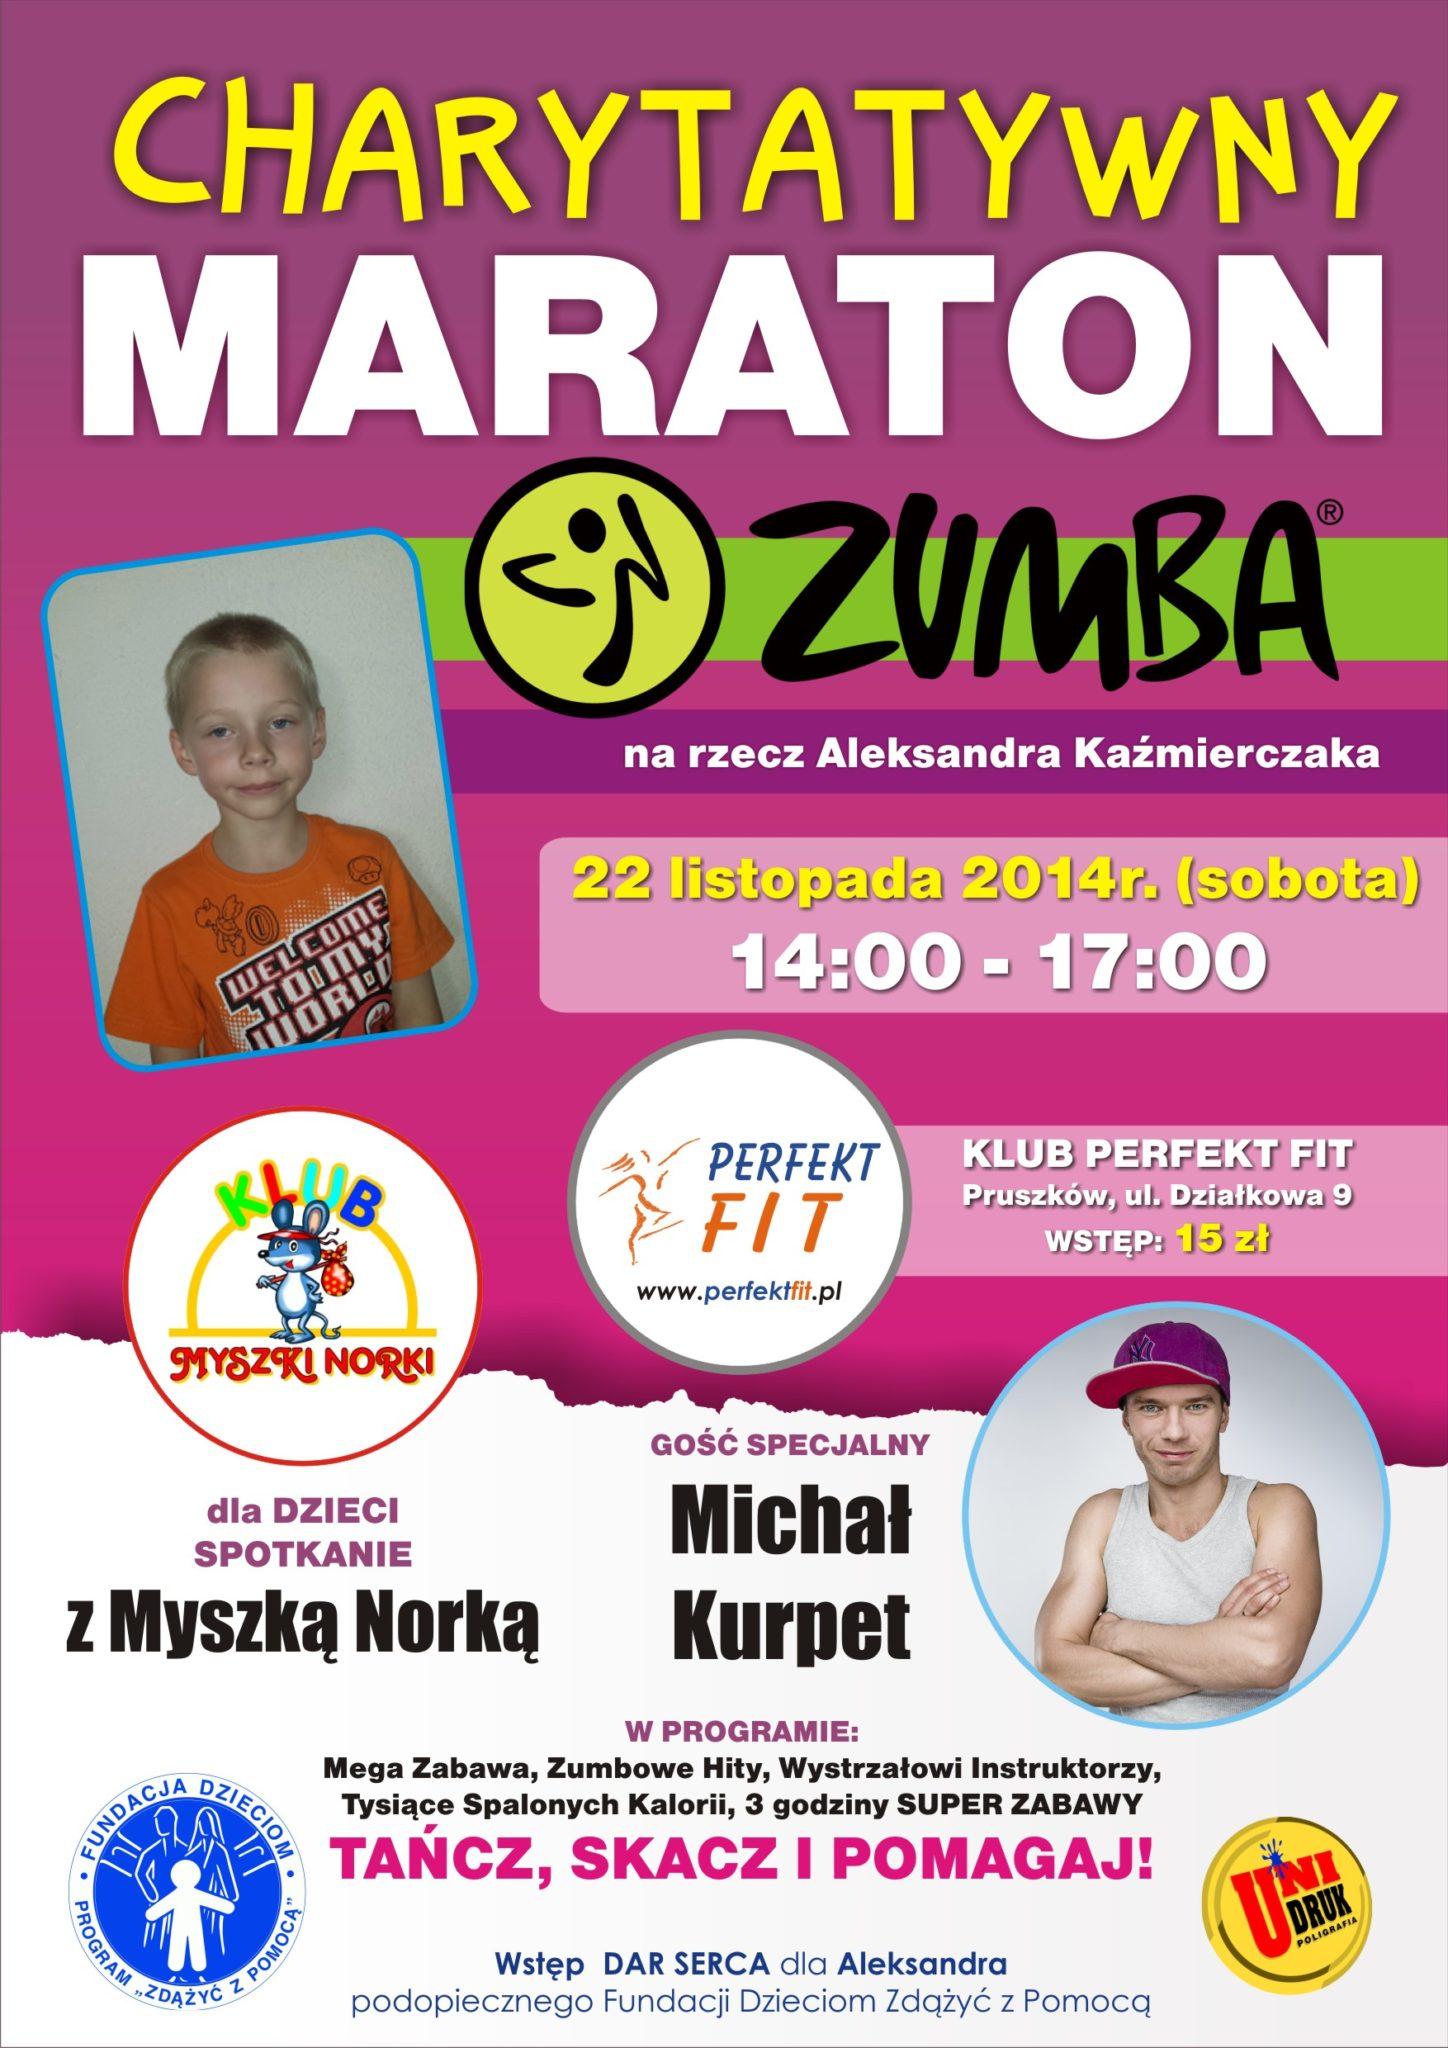 plakat_maraton_charytatywny2-2